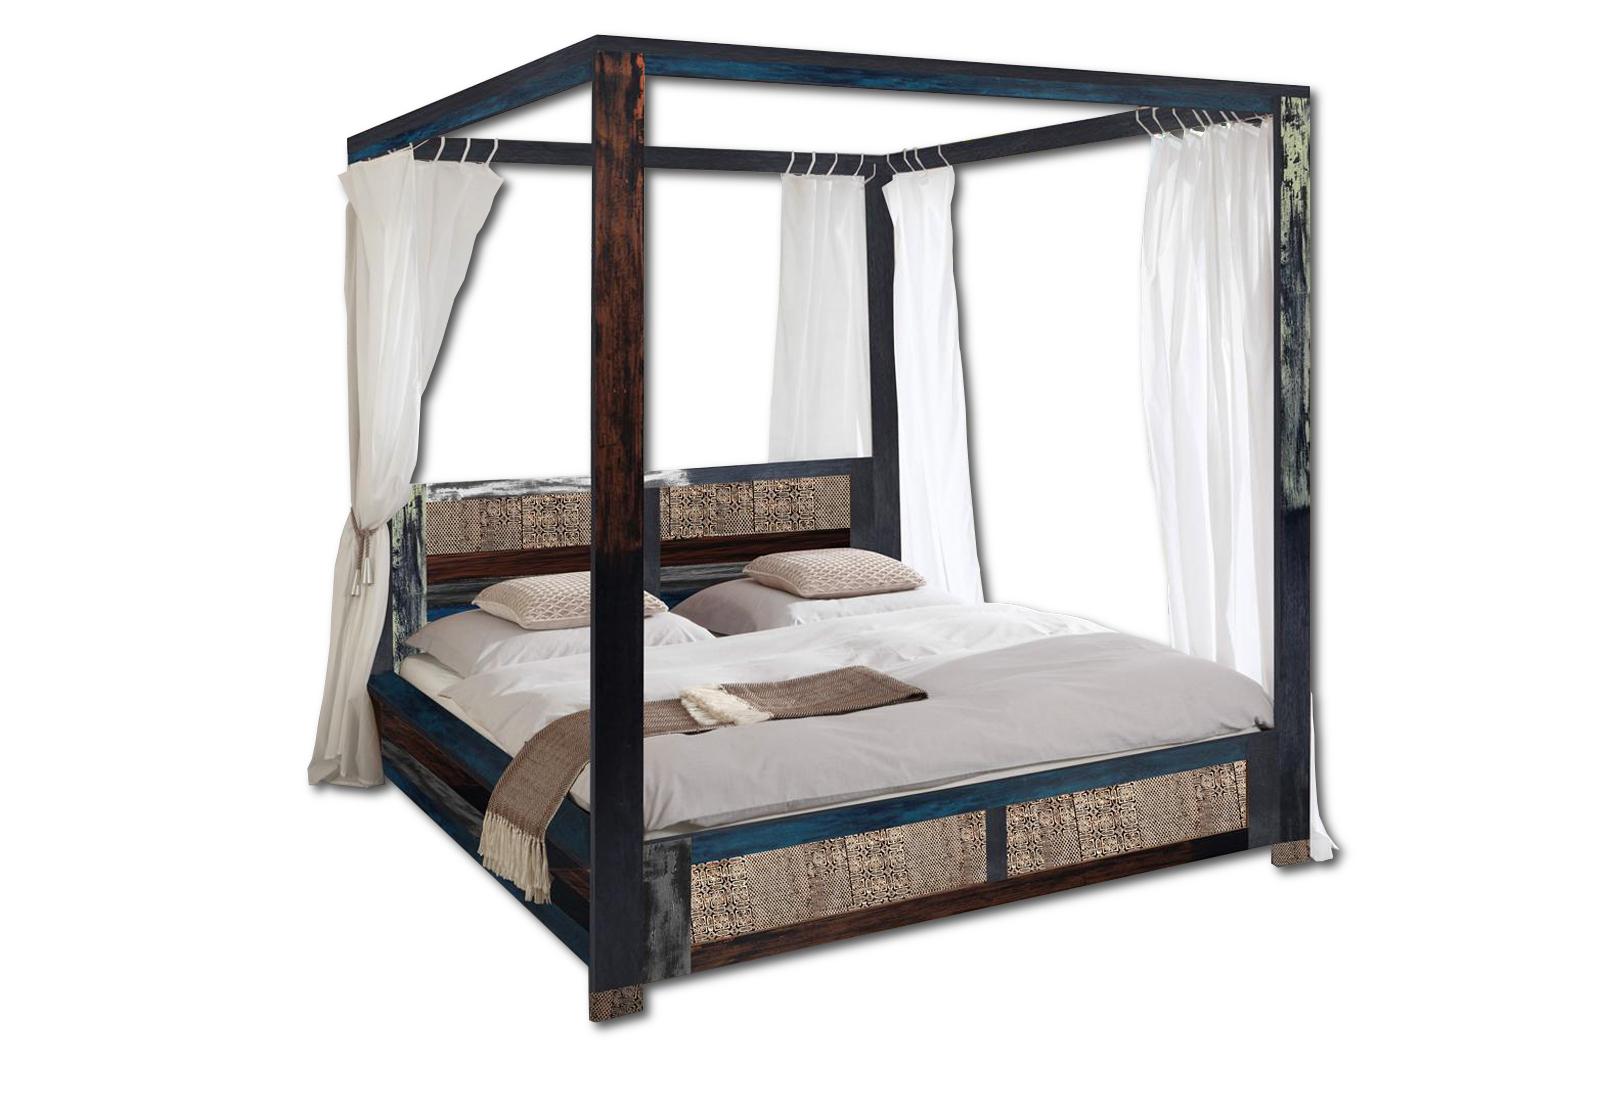 sam vintage himmelbett holzbett metall 140 x 200 cm bunt. Black Bedroom Furniture Sets. Home Design Ideas